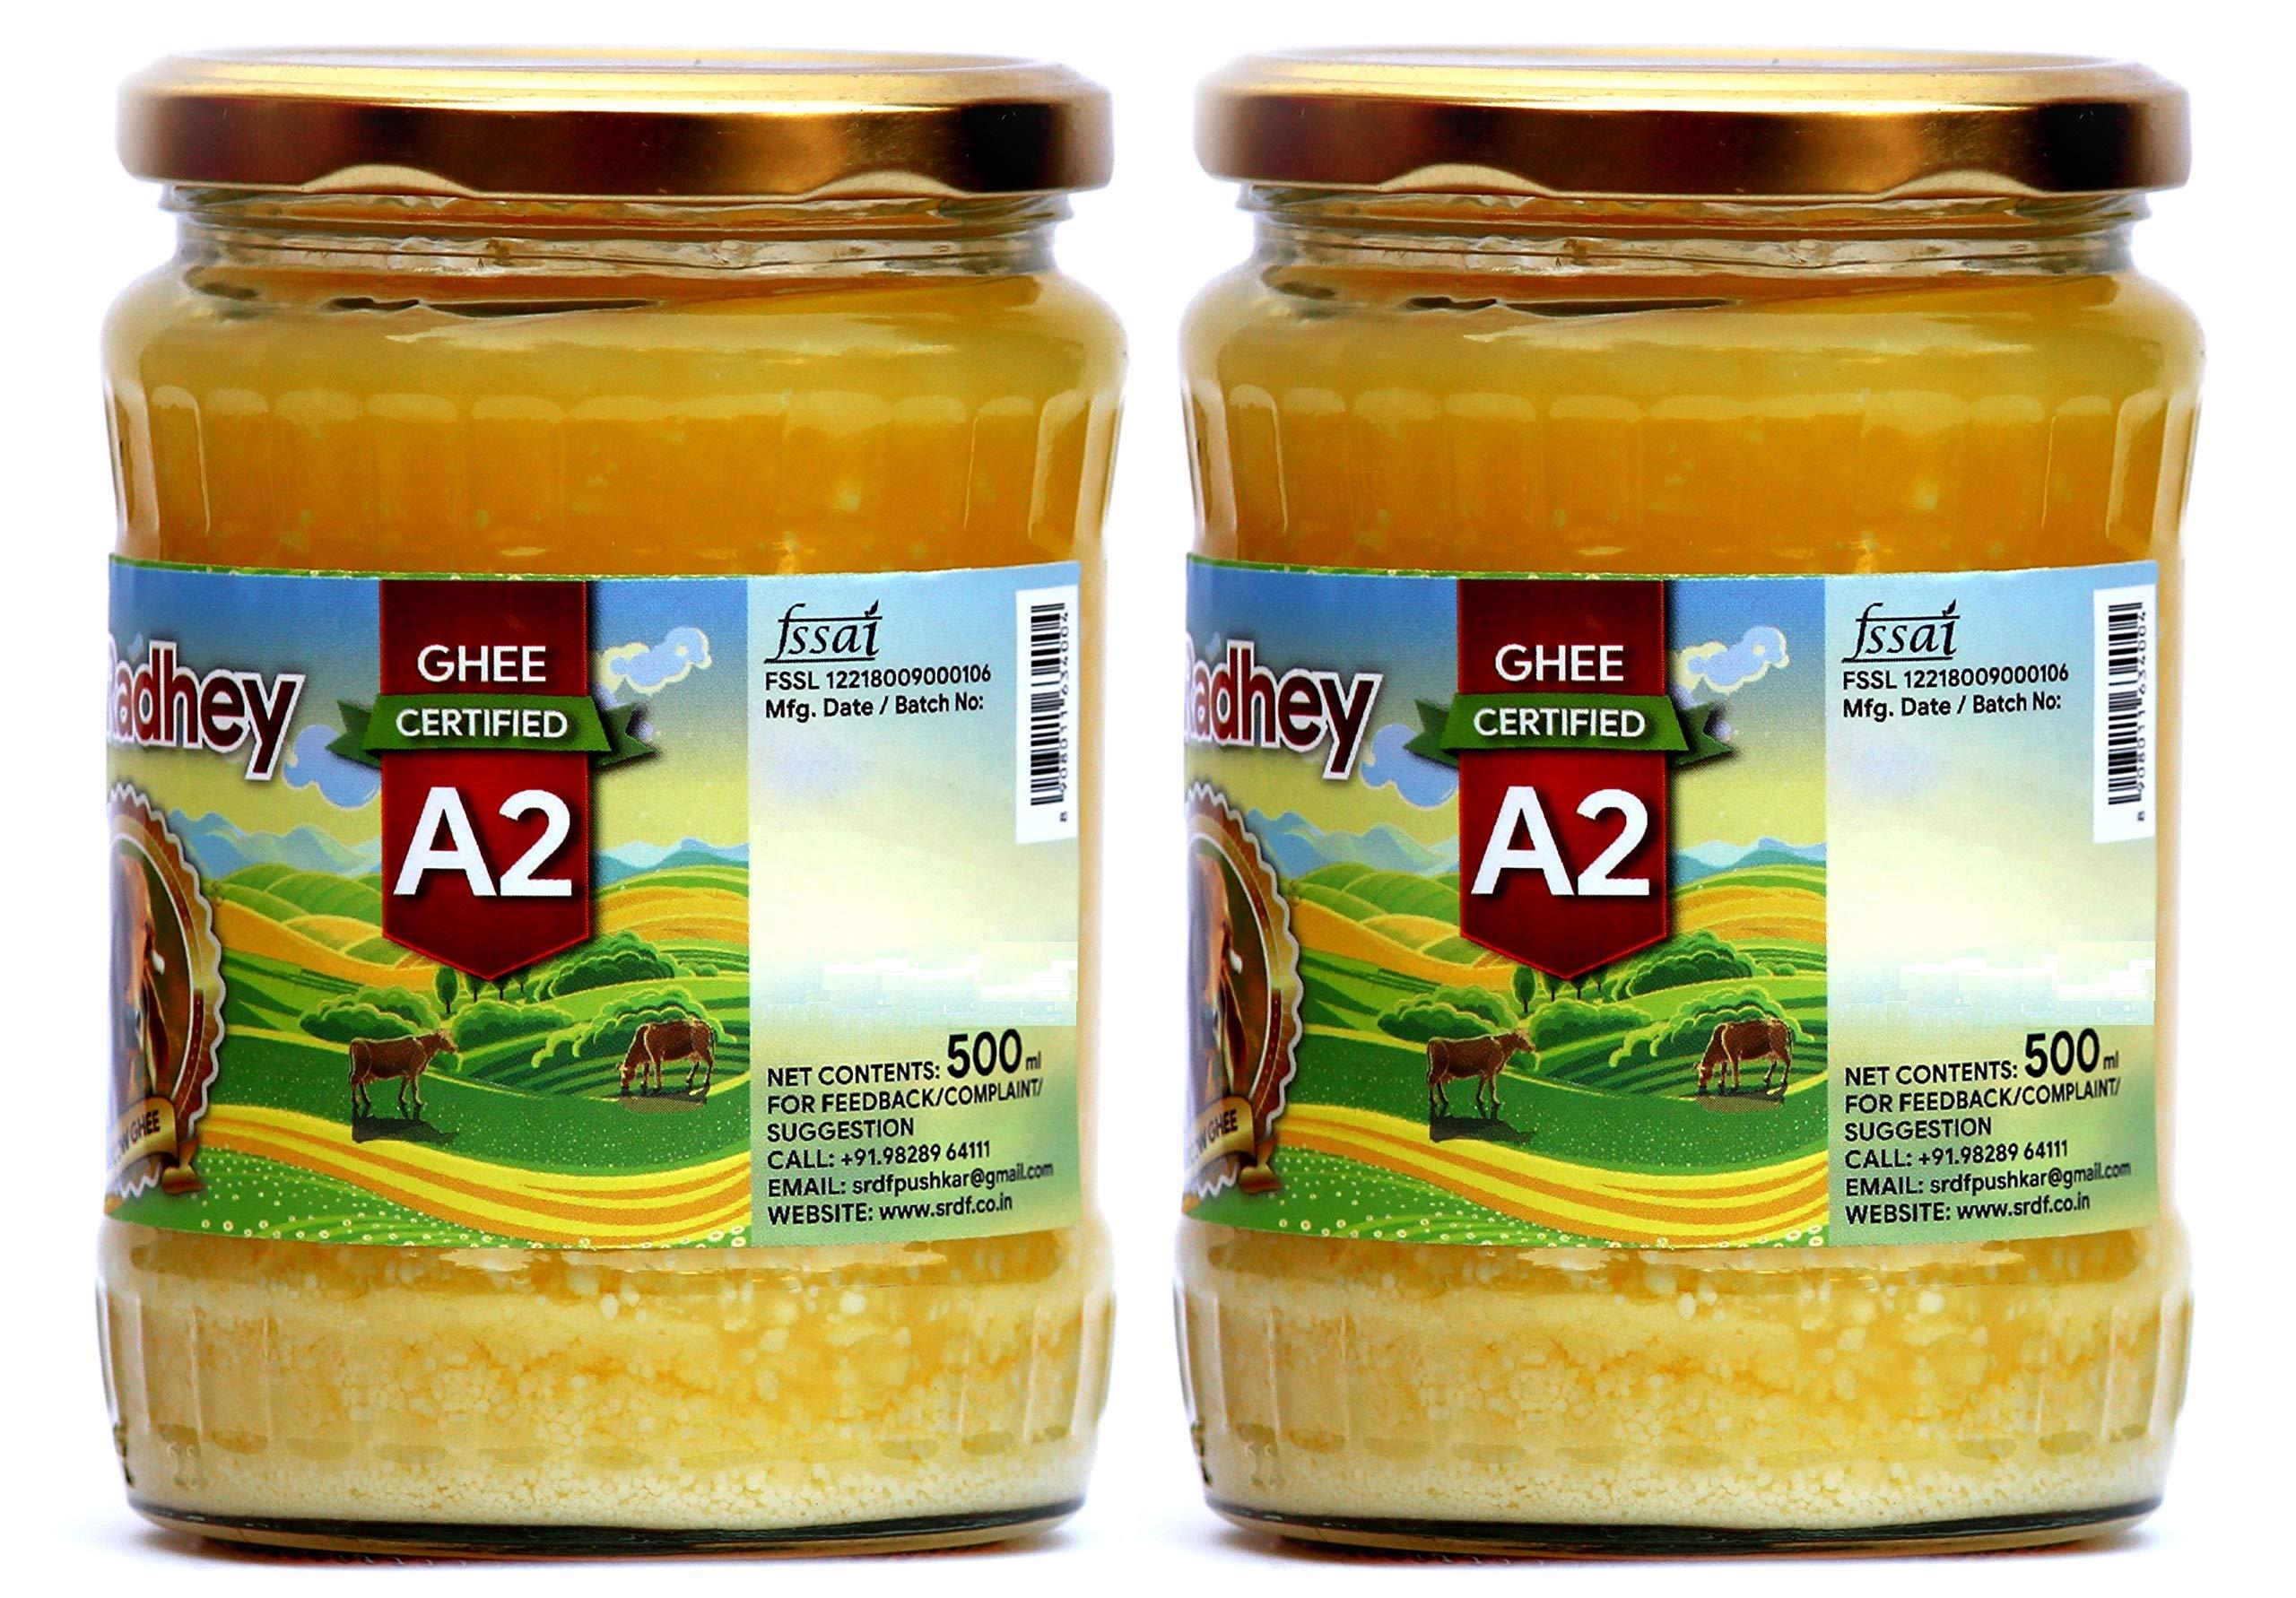 Shree Radhey Certified A2 Gir Cow Ghee - Gluten Free - (Traditionaly Hand Churned) (500 ml X 2) by Shree Radhey (Image #3)